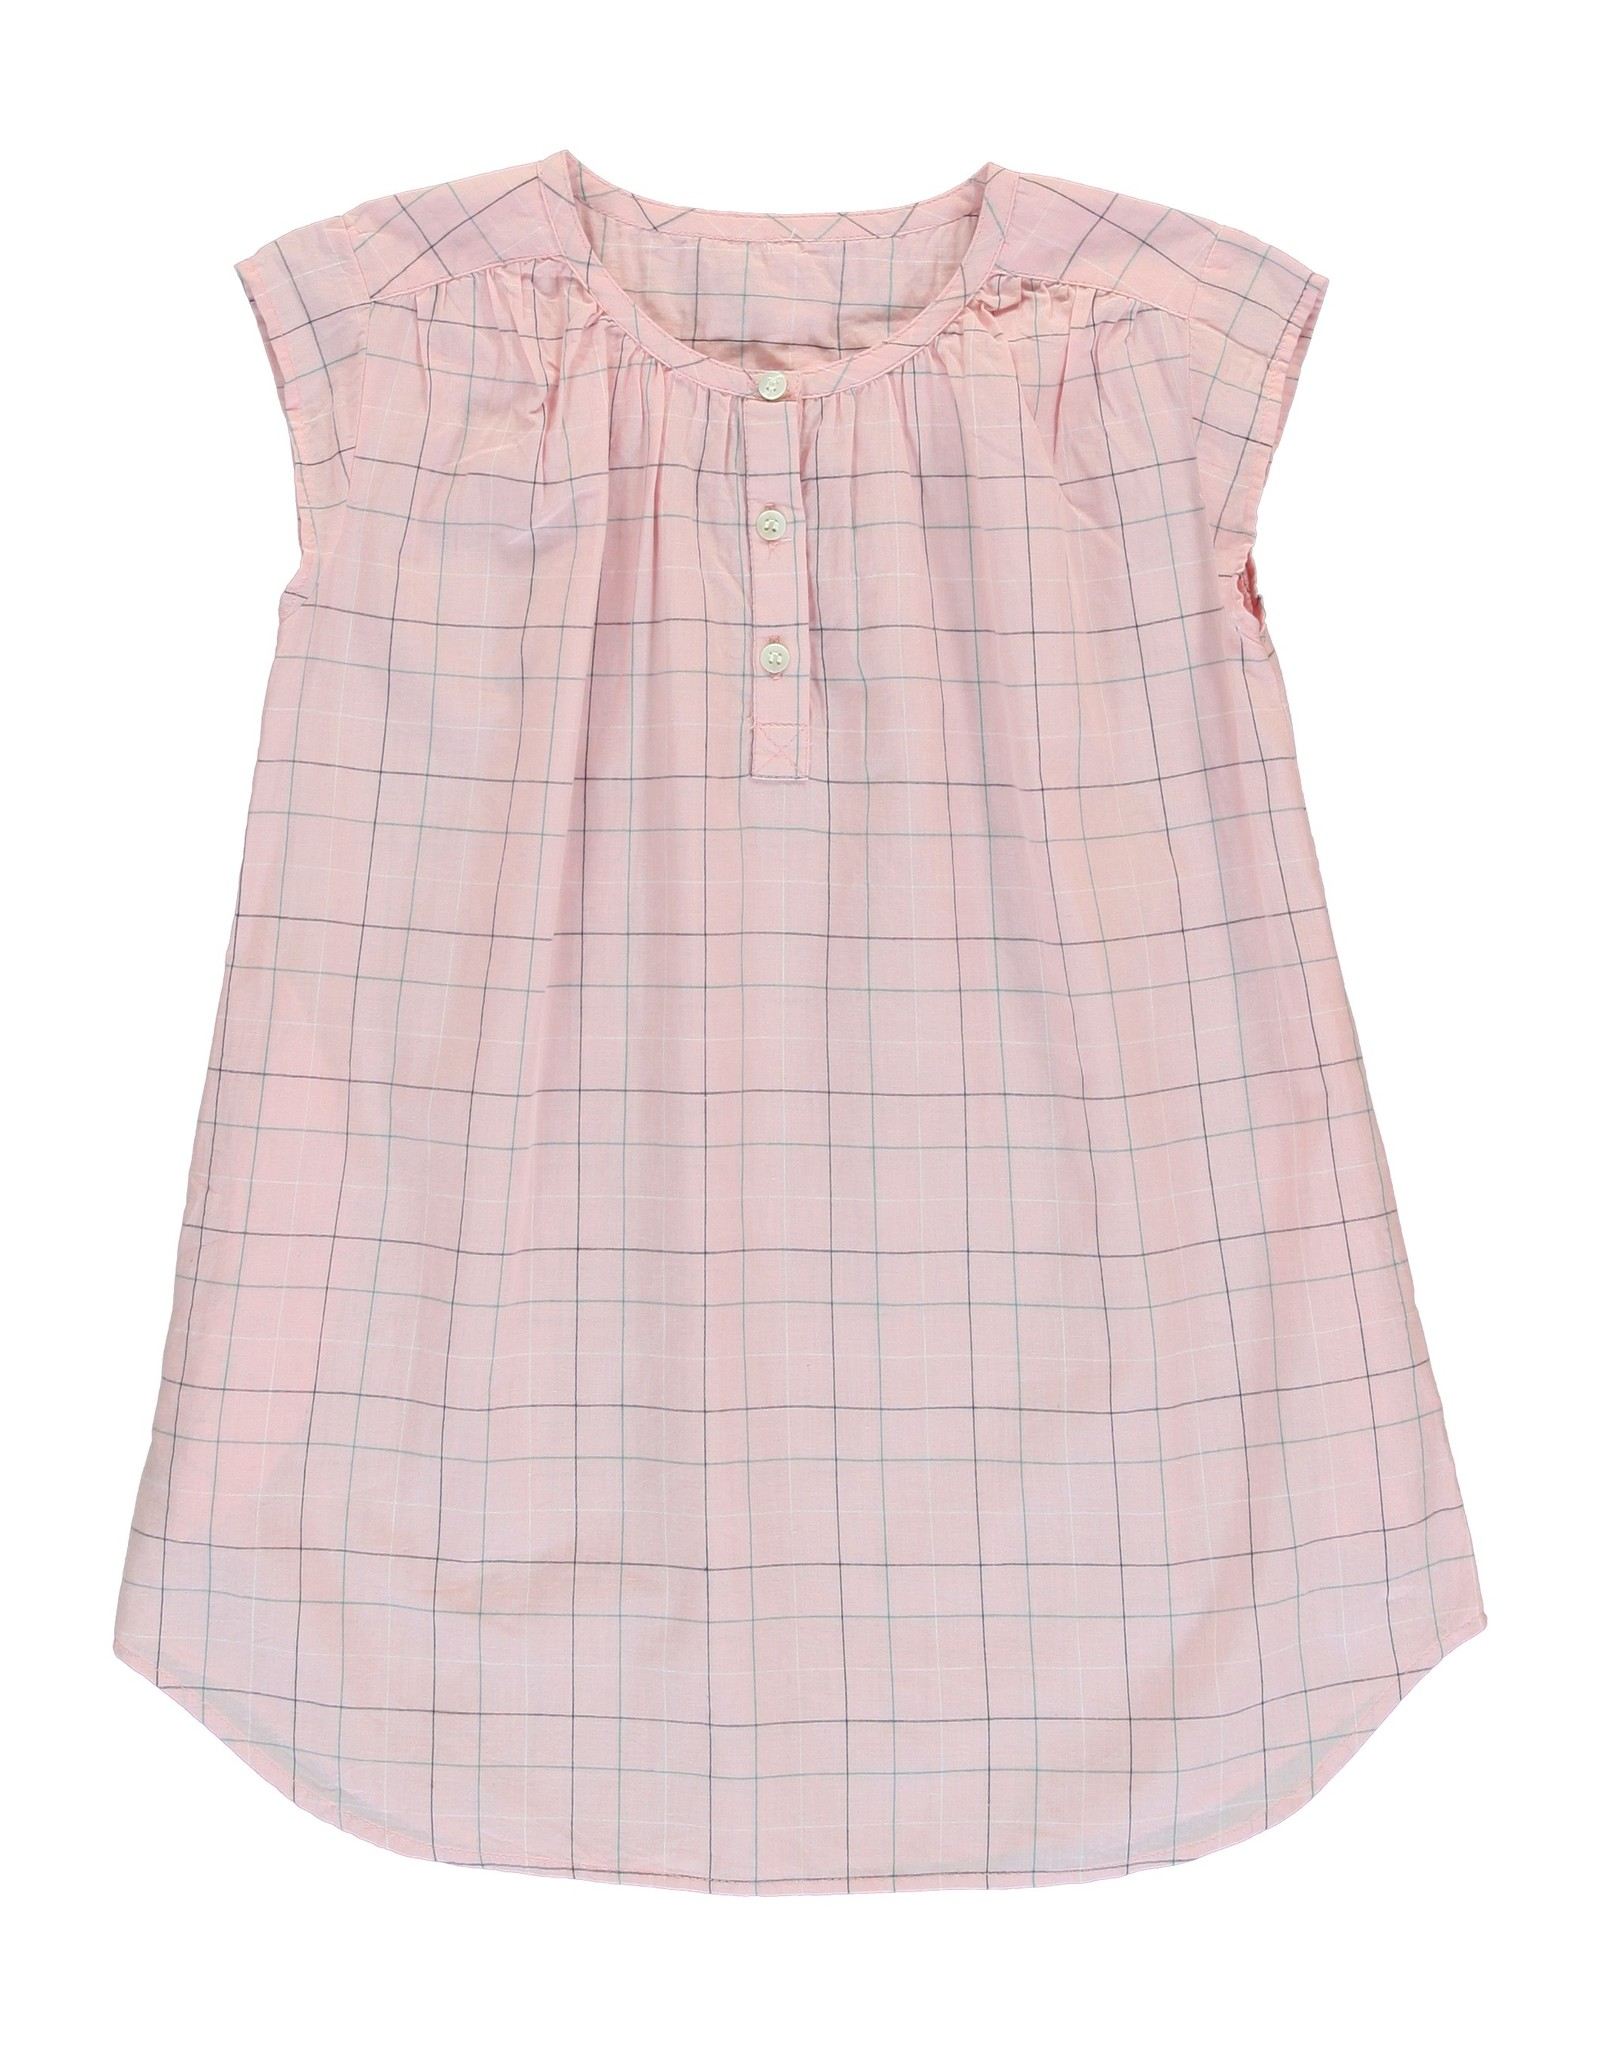 Dorélit Cyllene   Nightdress   Pink